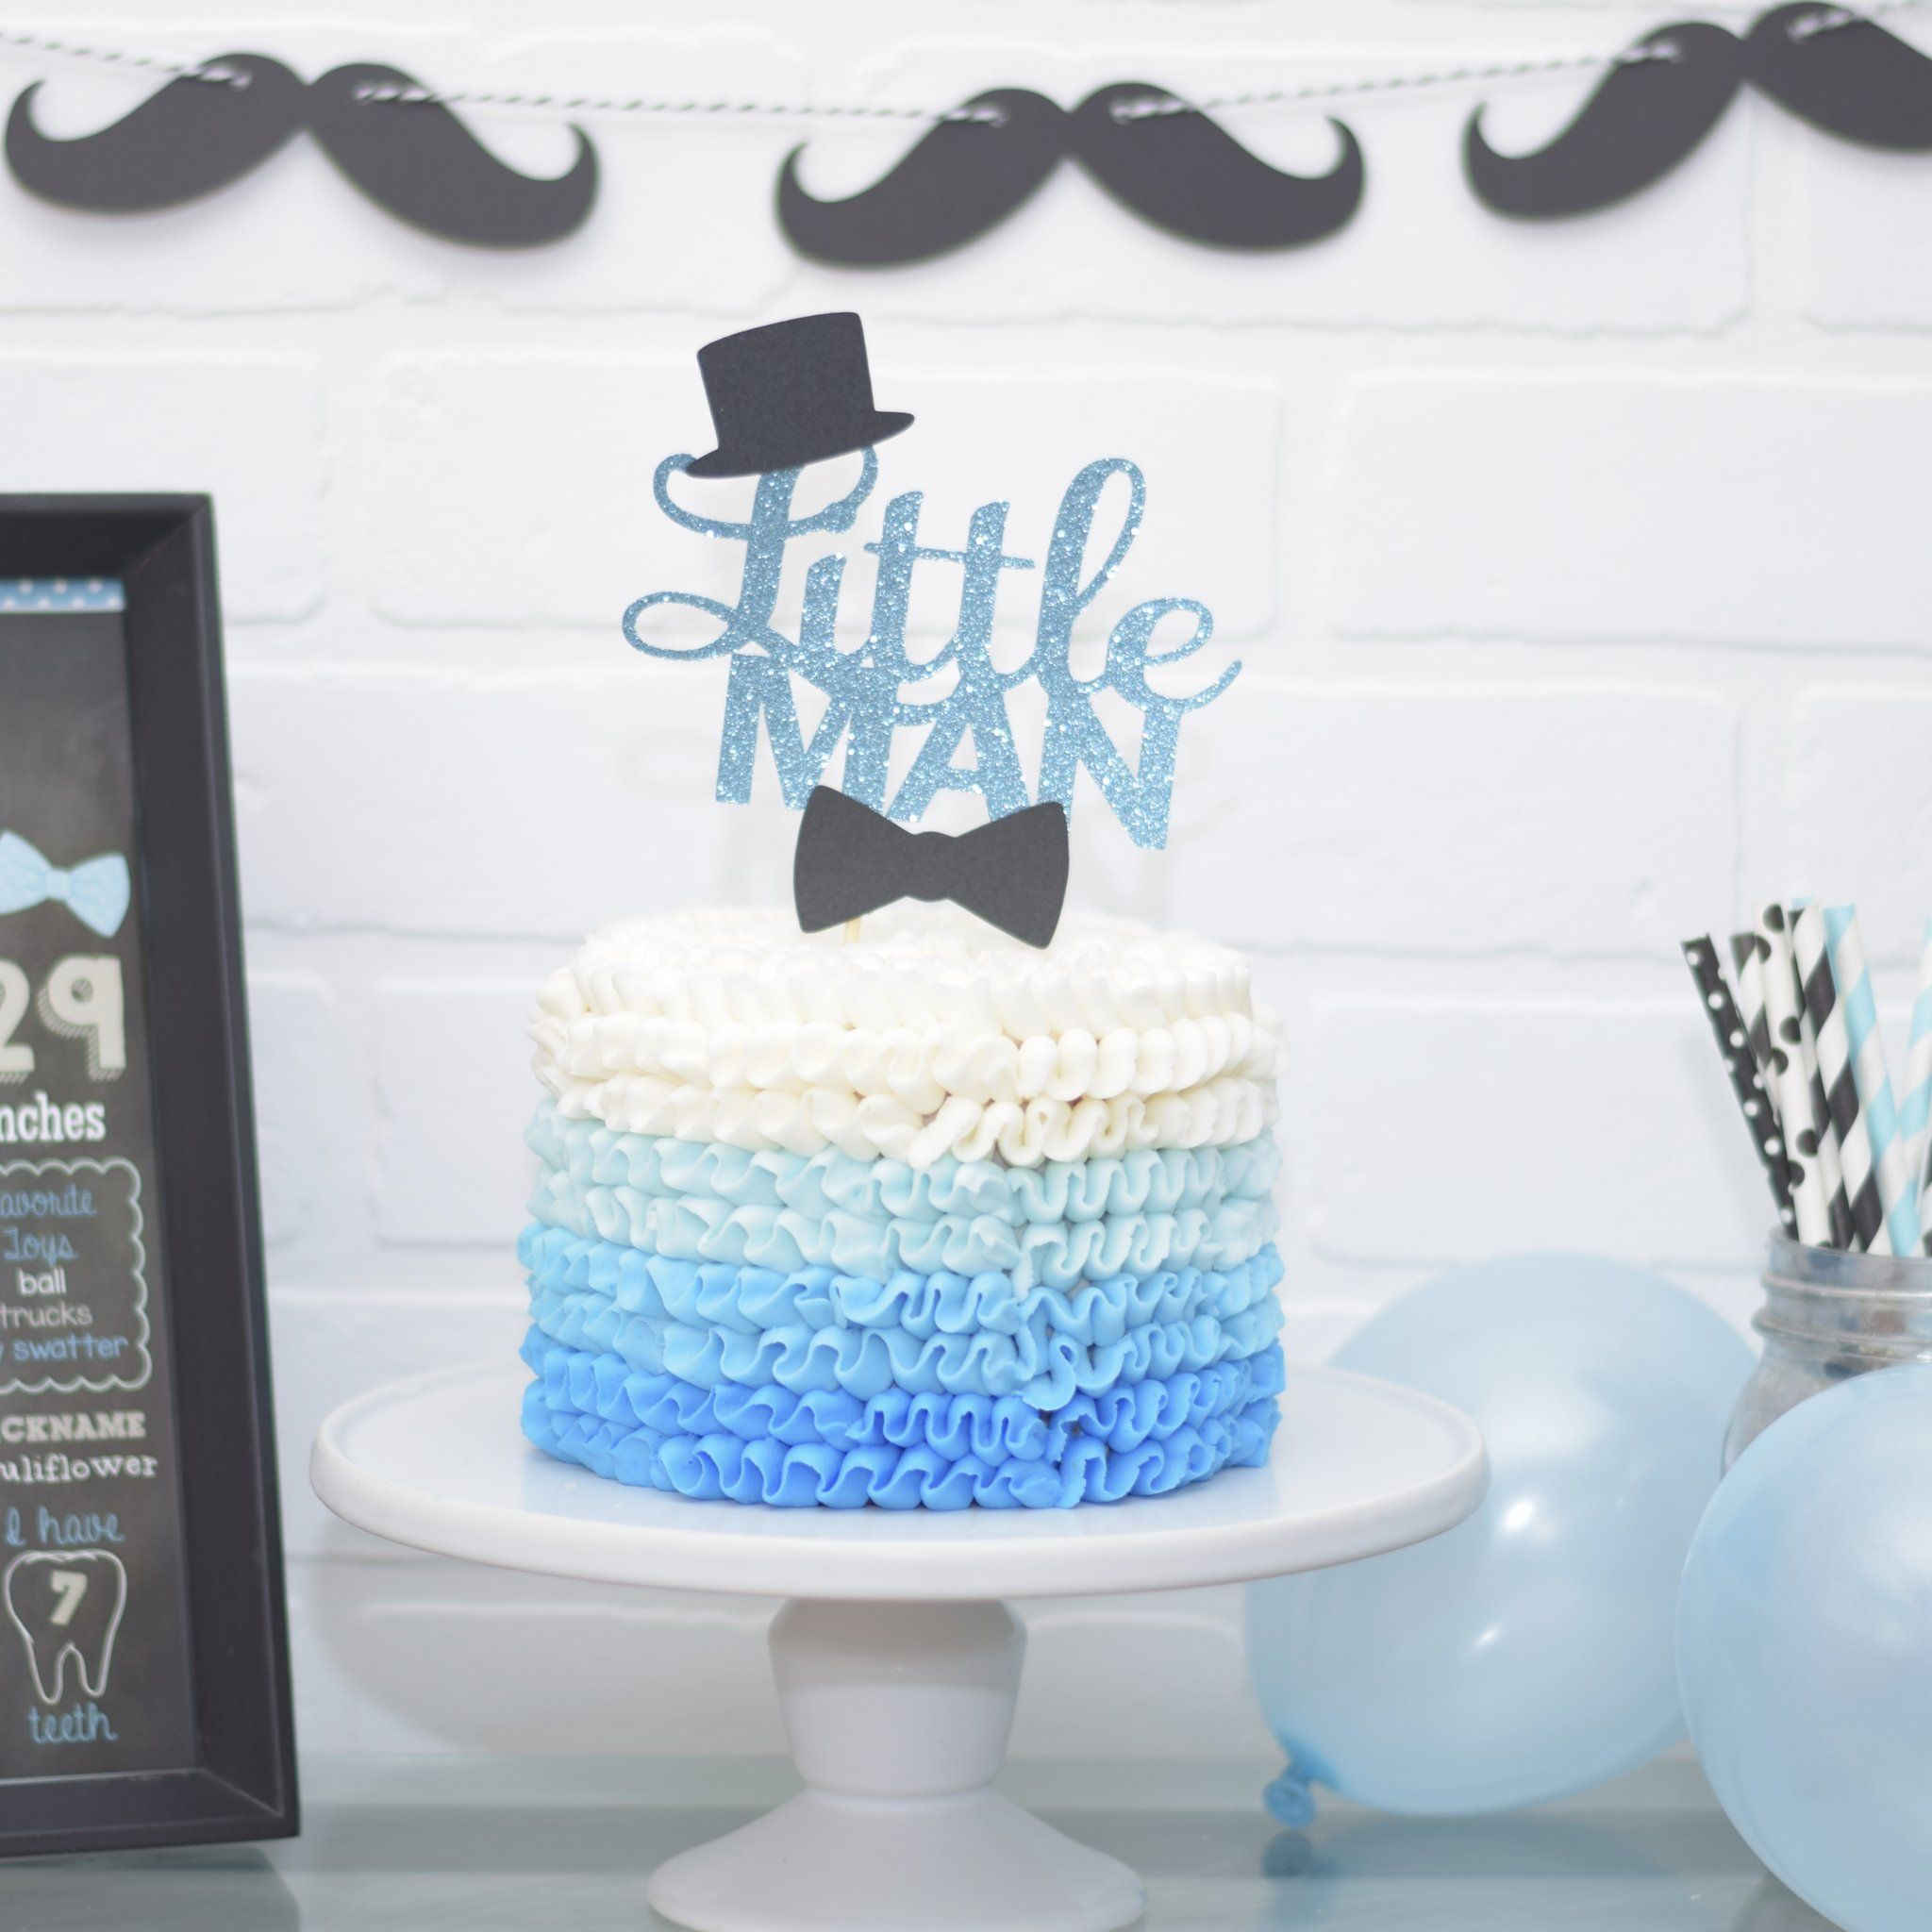 Little Man 1st Birthday Cake Topper Or Baby Shower Cake Topper Baby Shower Cake Toppers Boy Baby Birthday Cakes 1st Birthday Cake Topper